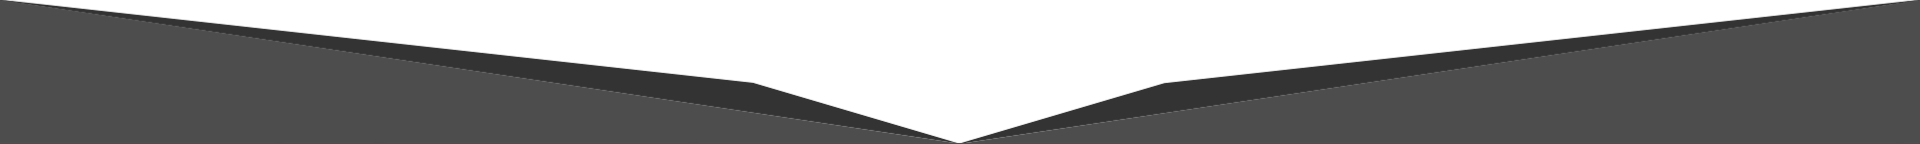 Aménagement extérieur 65, Aménagement extérieur Lourdes, Charpentier 65, Charpentier Lourdes, Constructeur de maison 65, Constructeur de maison Lourdes, Maçon 65, Maçon Lourdes, Maçonnerie 65, Maçonnerie Lourdes, Pisciniste 65, Pisciniste Lourdes, Rénovation charpente 65, Rénovation charpente Lourdes, Rénovation maison 65, Rénovation maison Lourdes